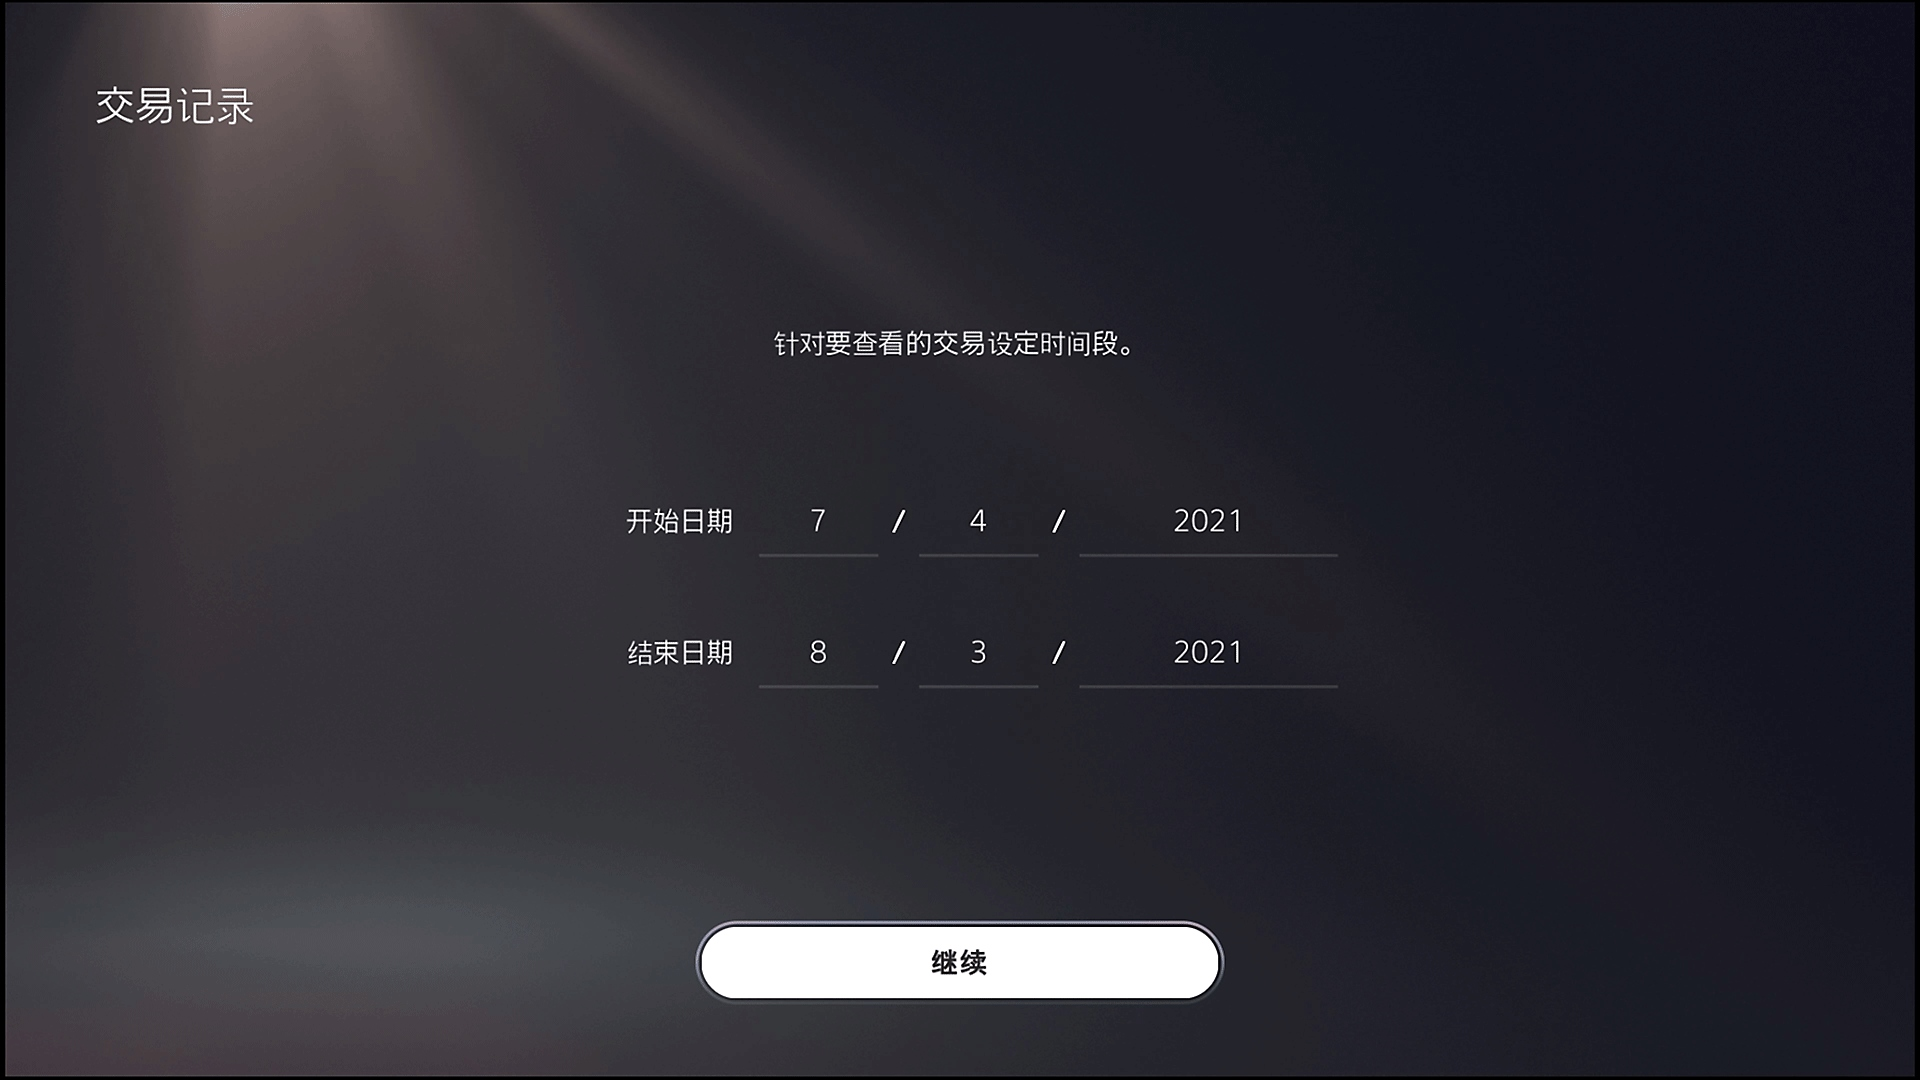 PS5 交易历史记录屏幕